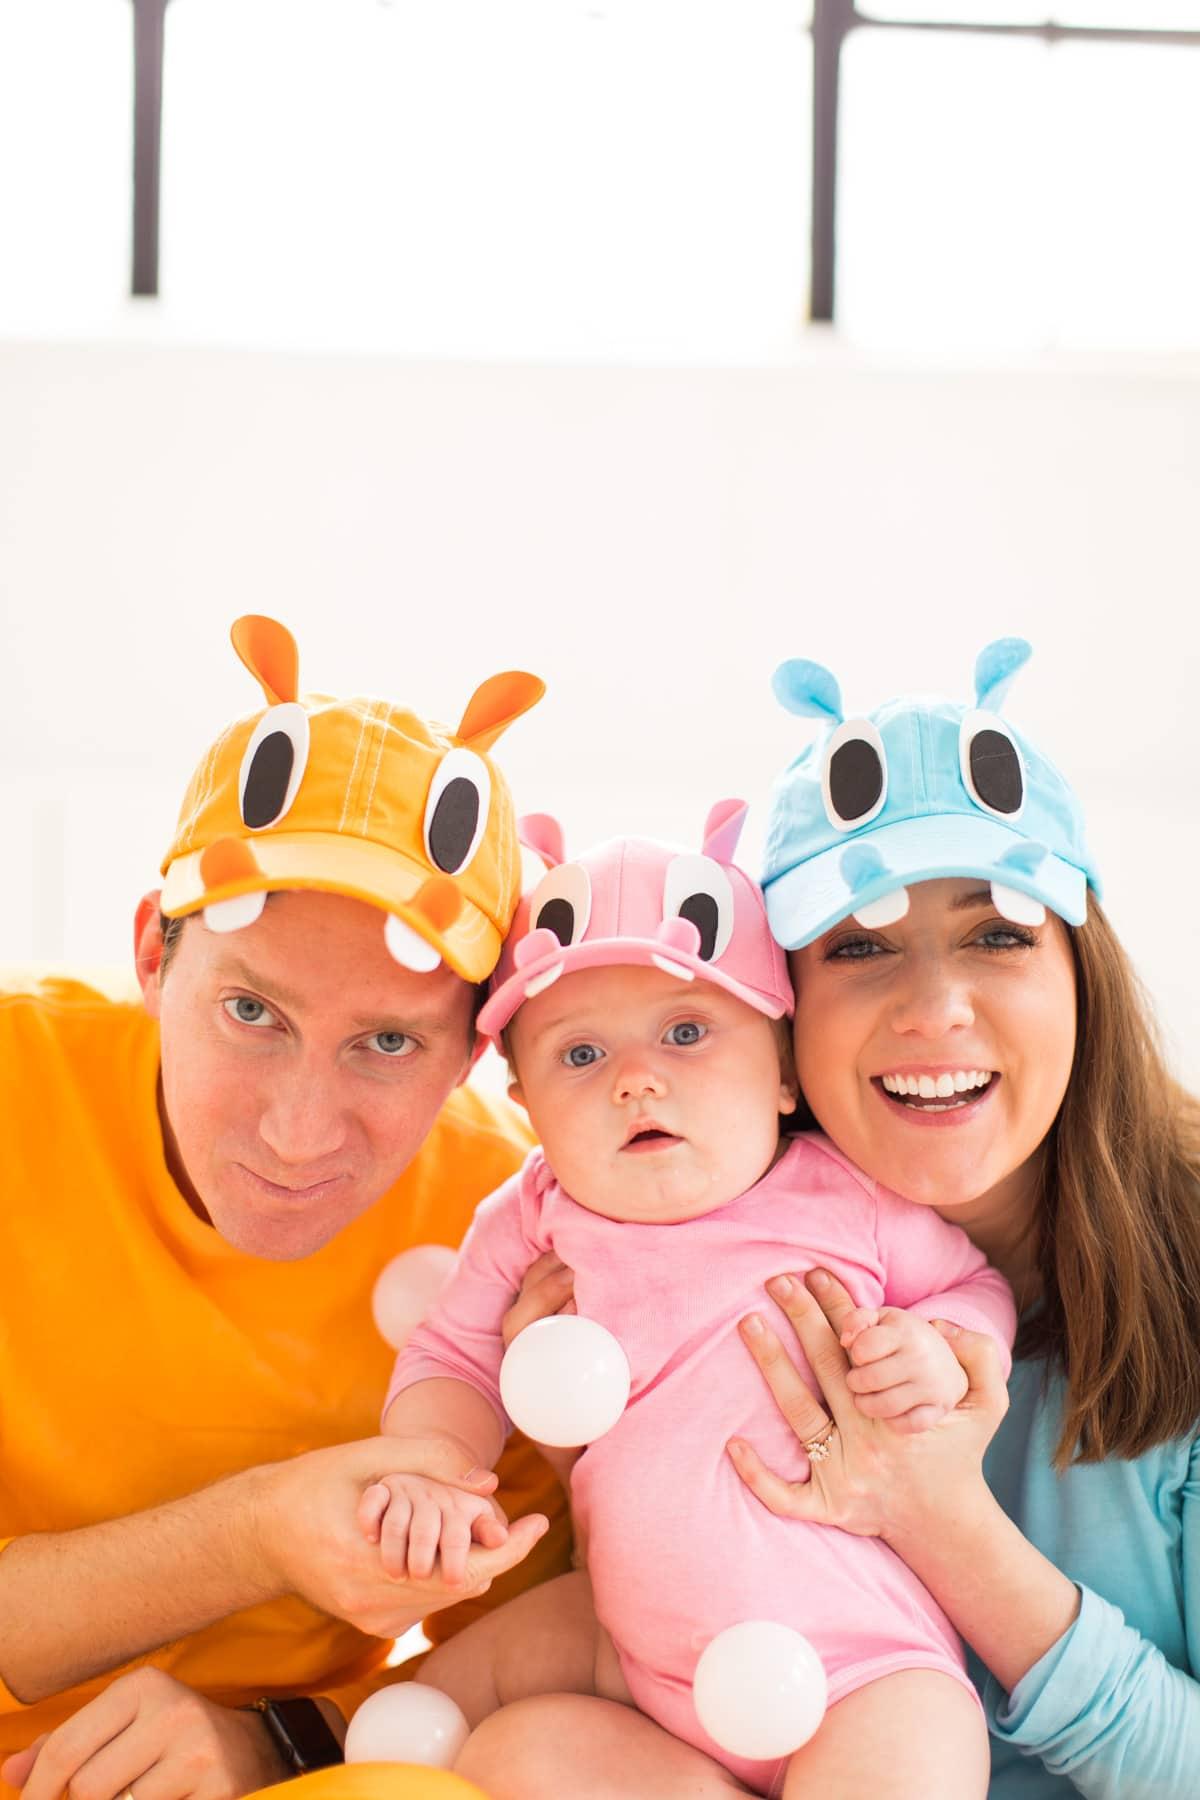 Our Family Diy Hungry Hippos Costume Idea Sugar Amp Cloth